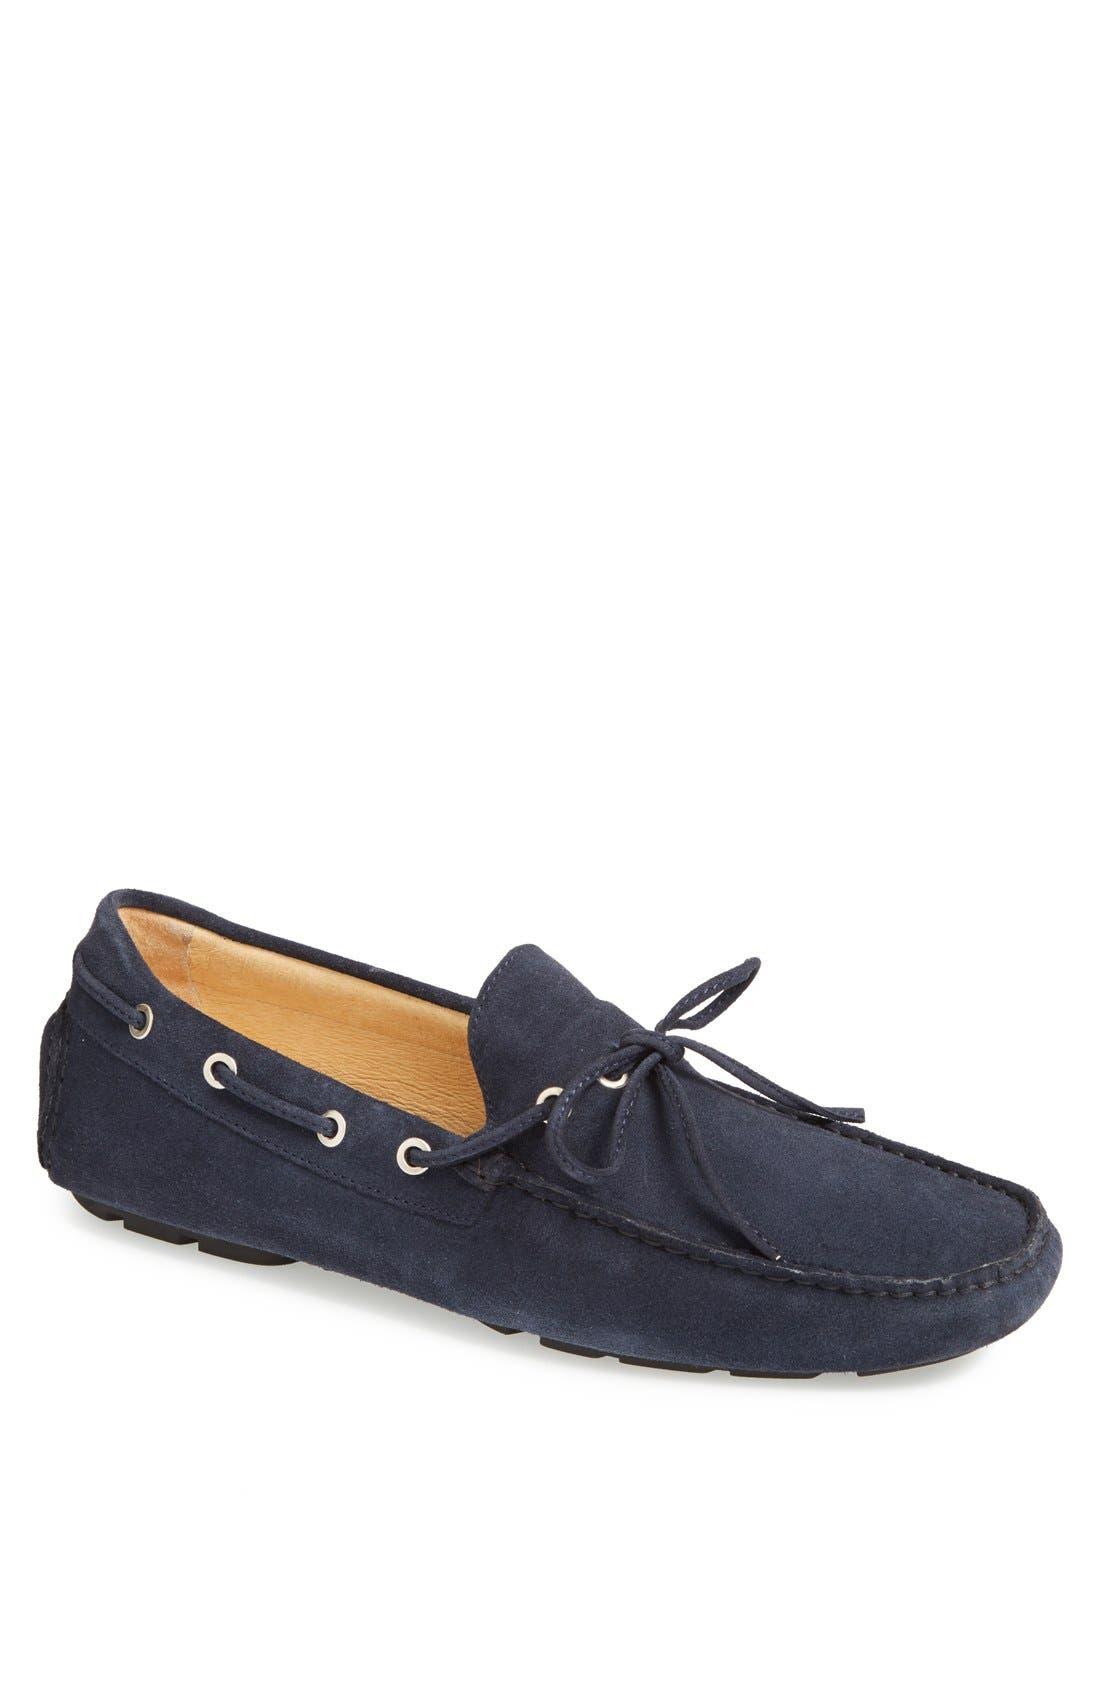 Alternate Image 1 Selected - Boemos Suede Driving Shoe (Men)